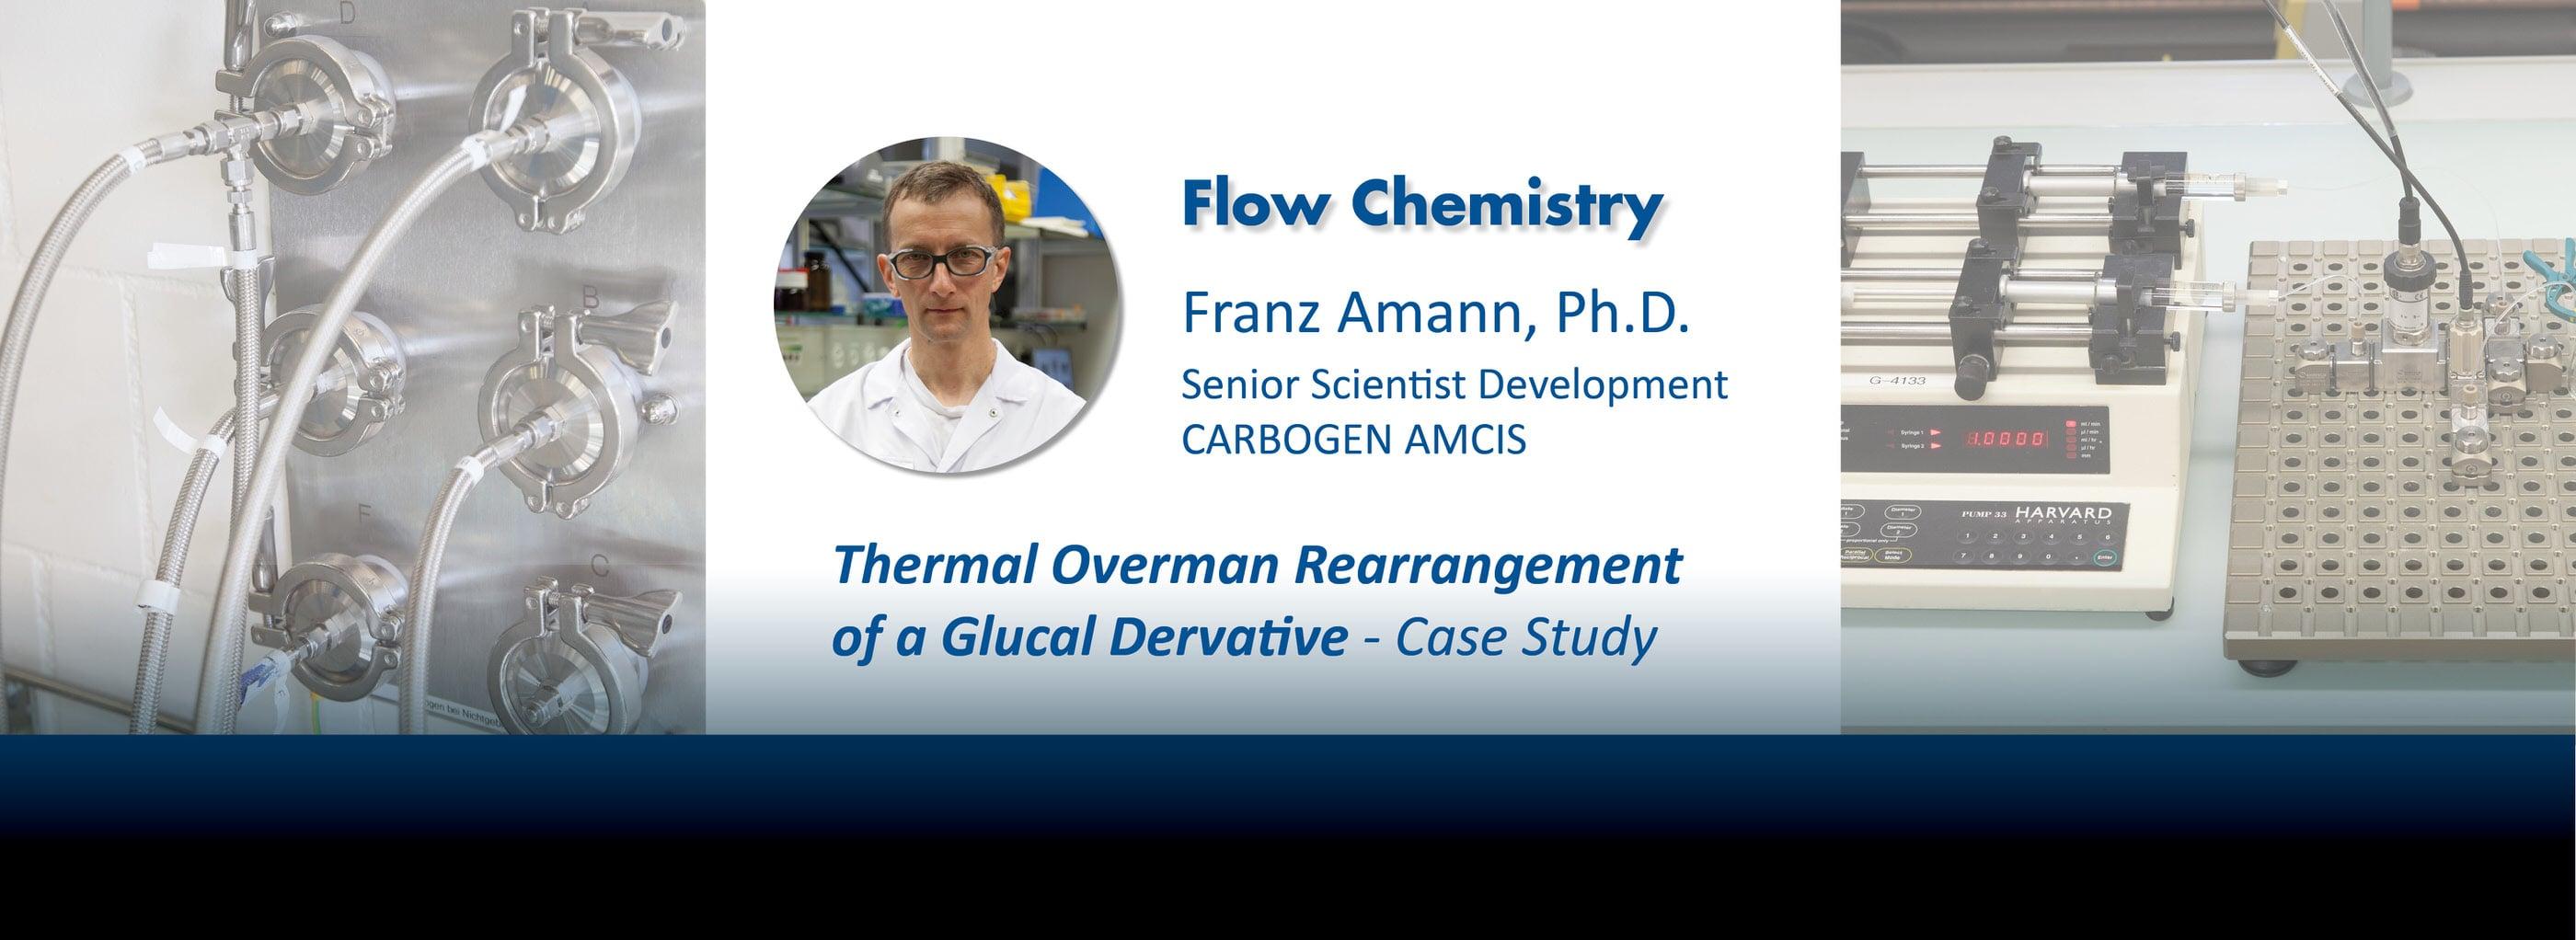 Flow_Chemistry_Case_Study